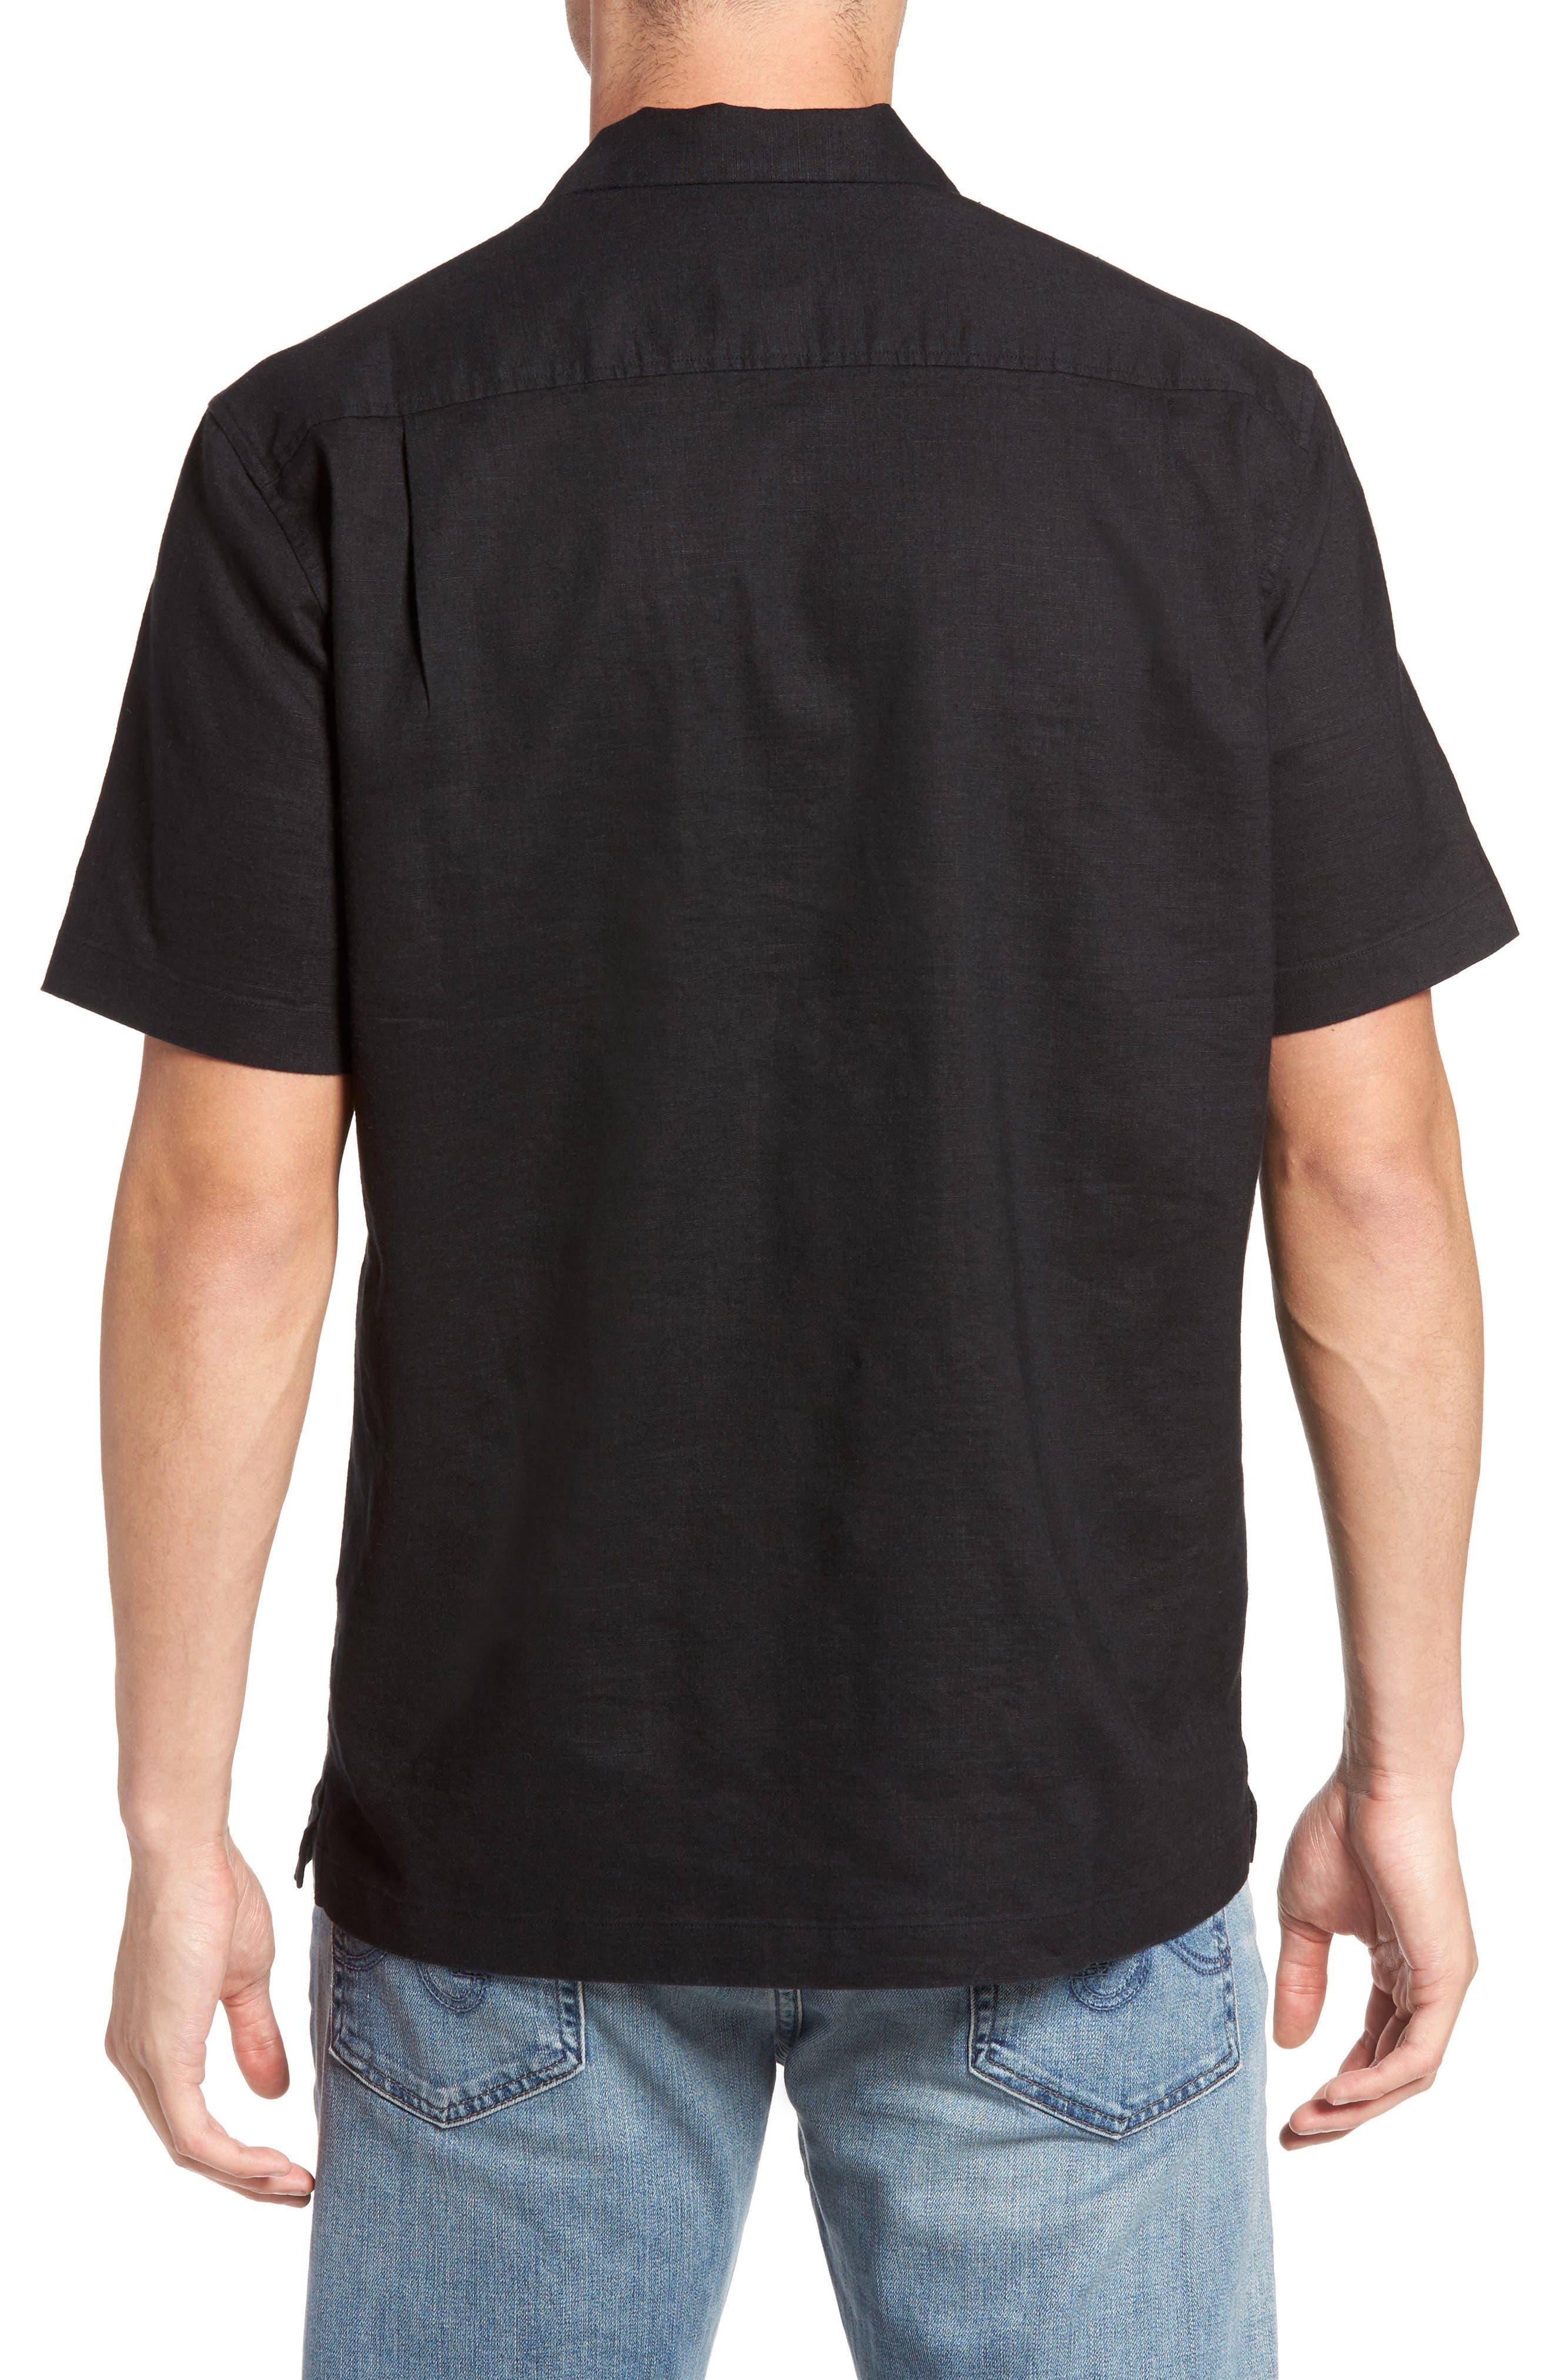 Alternate Image 2  - Tommy Bahama Monaco Tides Standard Fit Linen Blend Camp Shirt